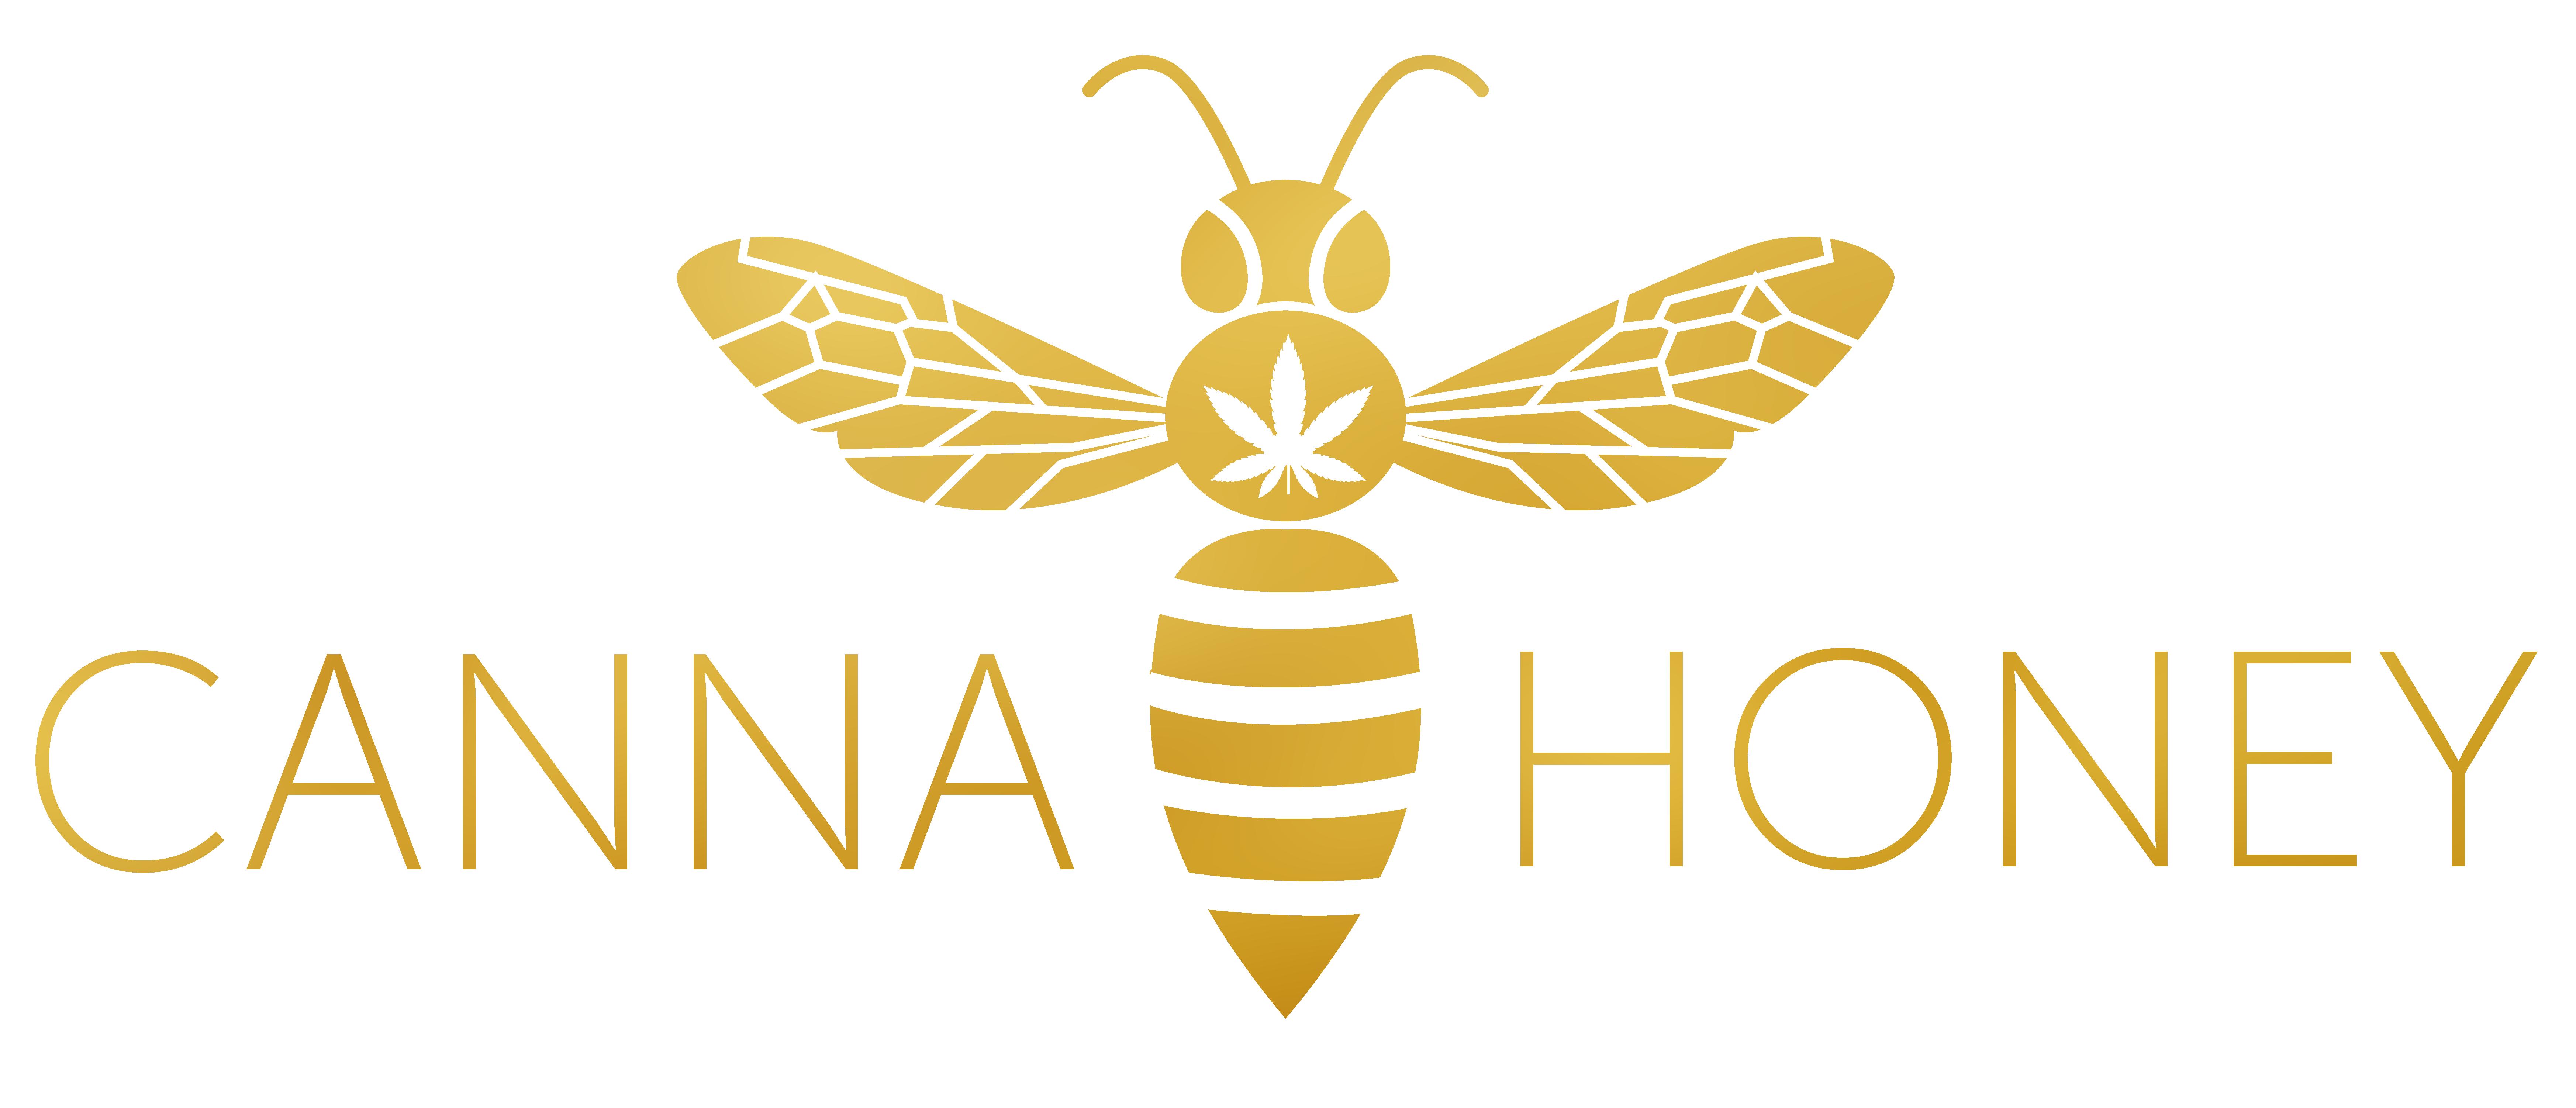 Canna Honey CBD Hemp THC Oregon Homemade Medicinal Marijuana Logo